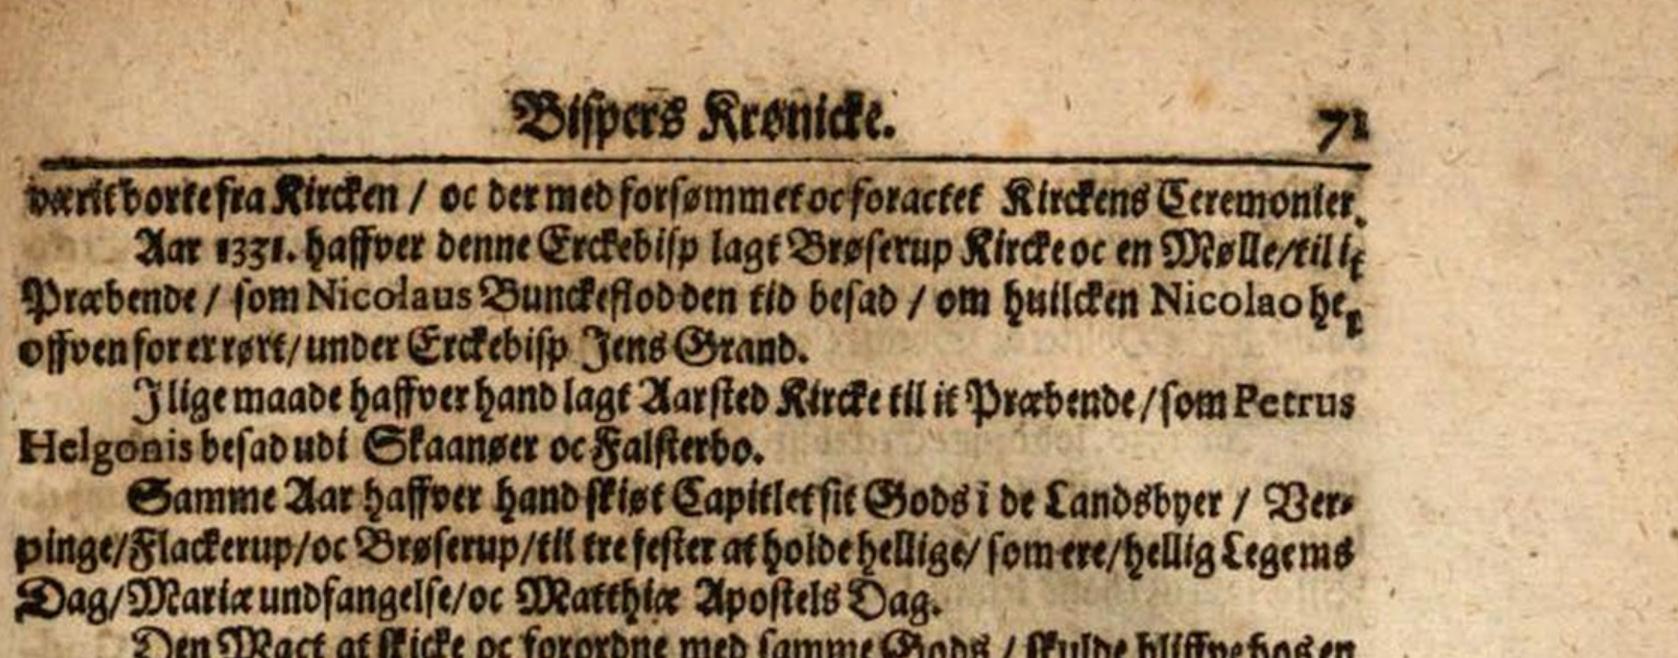 Den geistlige Histori offver alt Danmarckis Rige; det er en kort Krønicke hvorledis Bisperne sammesteds; ec den christelige Religion udi disse Lande er forfremmet; opvoxt oc forekommen indtil vor tid. Av Arrild Huitfeld, år 1653. Brösarp nämns på sida 71 som Brøserup.